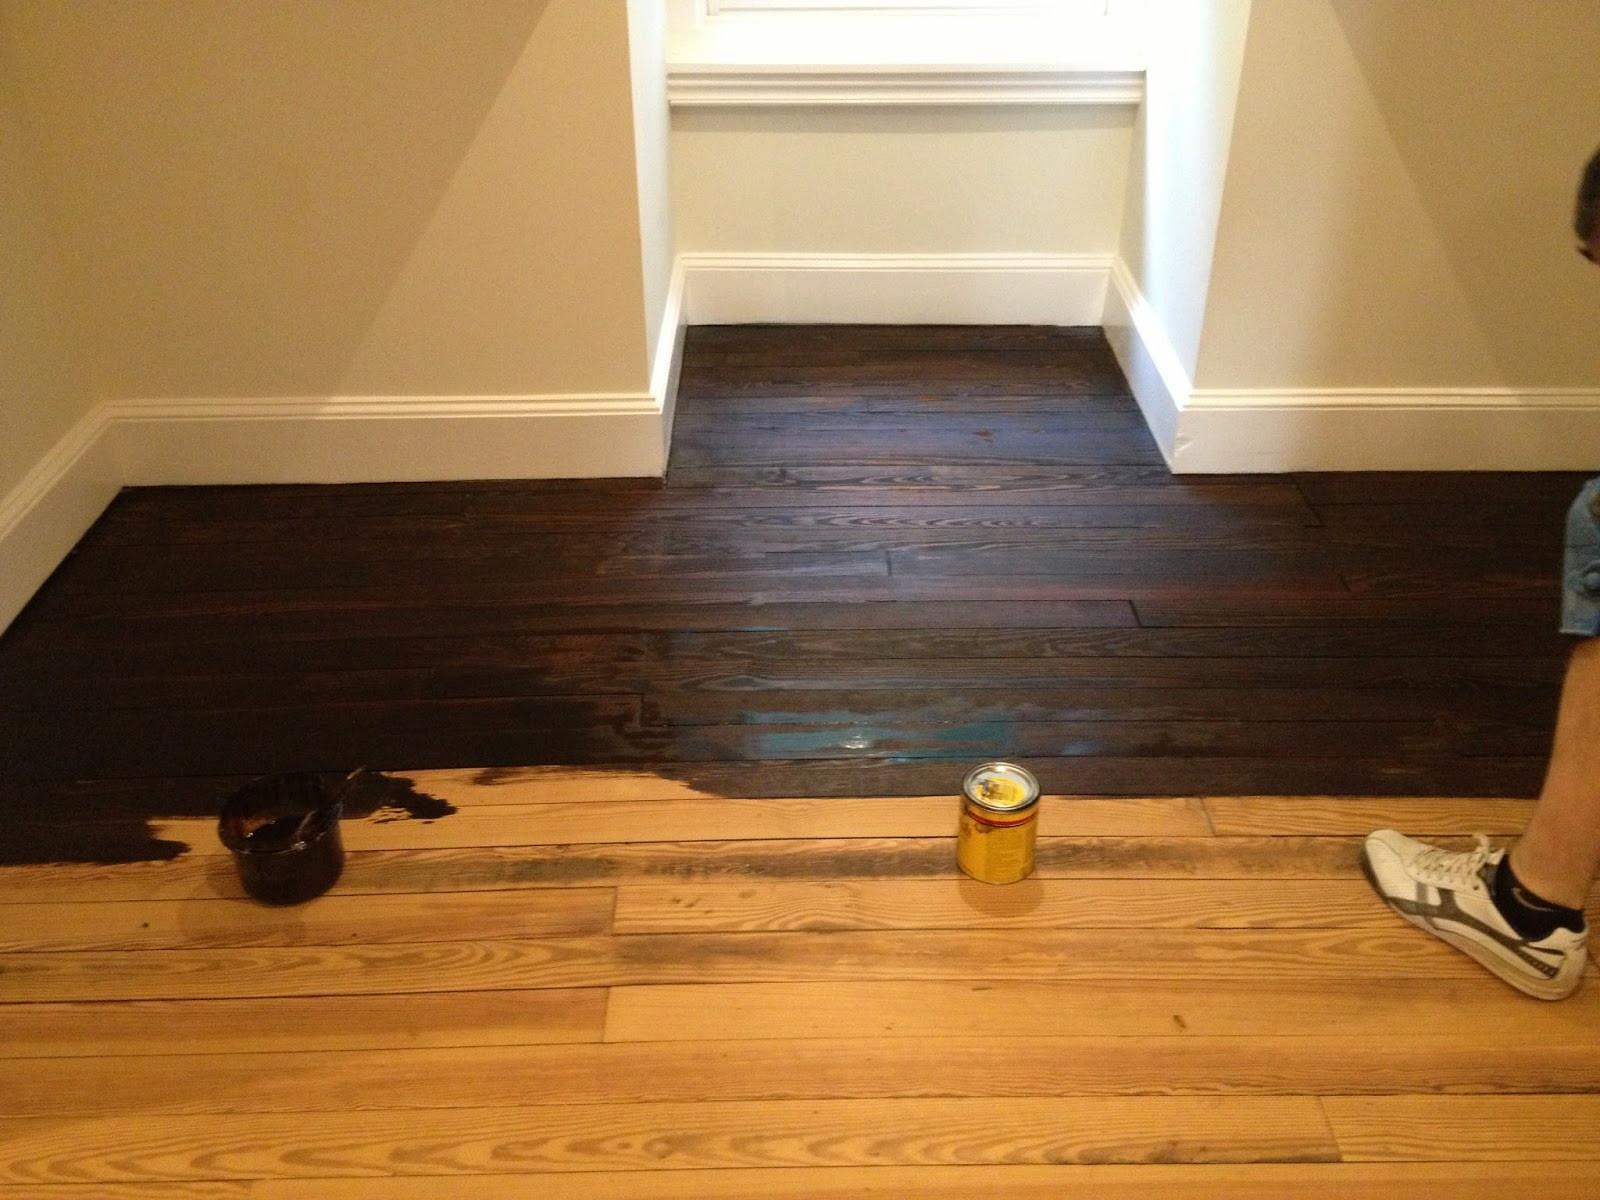 Best ideas about DIY Wood Floor . Save or Pin High Street Market 3rd Floor Refinished Hardwood Floor DIY Now.